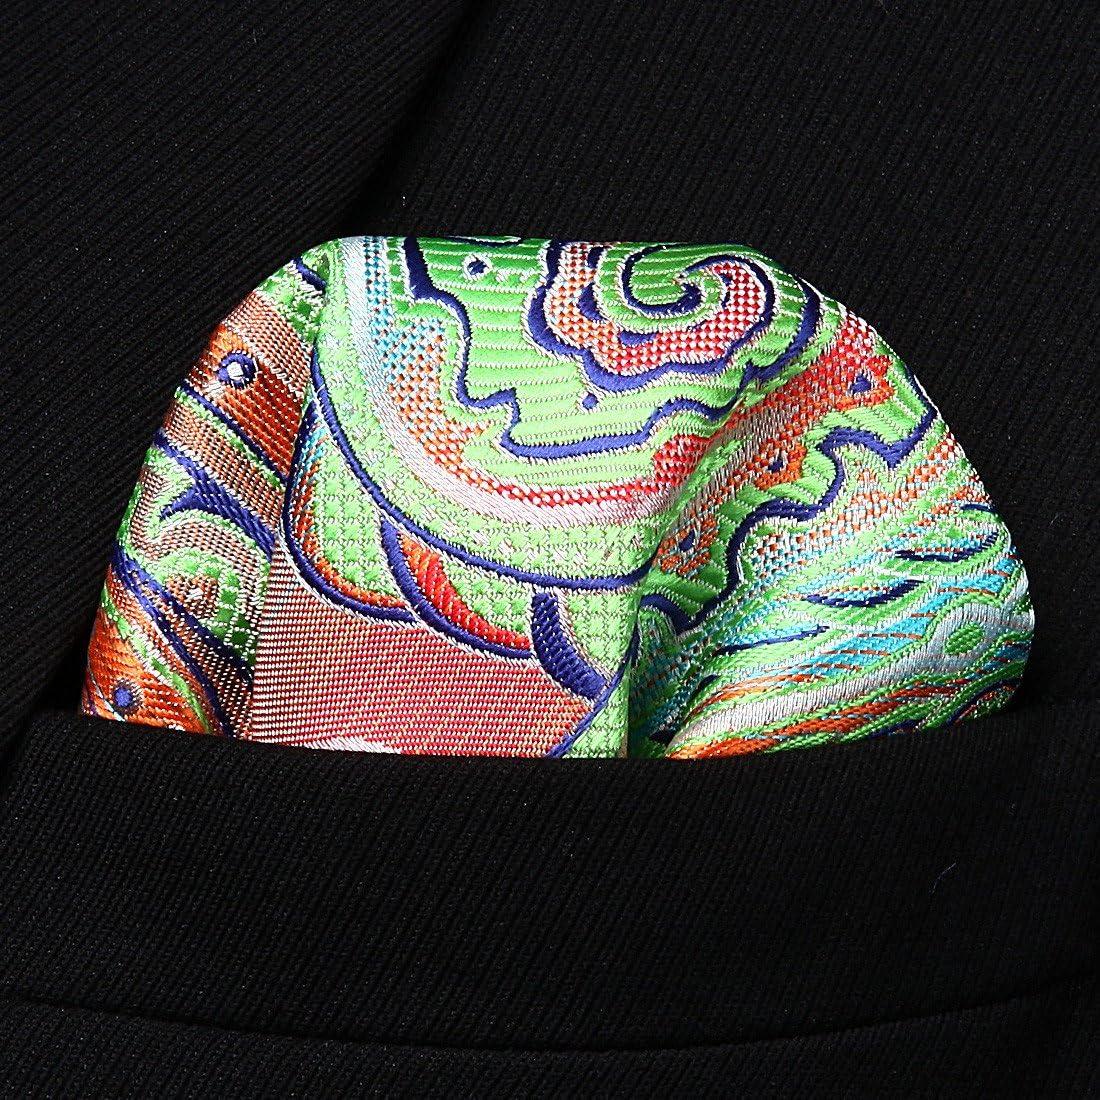 Enmain Paisley Floral Jacquard Woven Mens Wedding Silk Tie Pocket Square Necktie Set